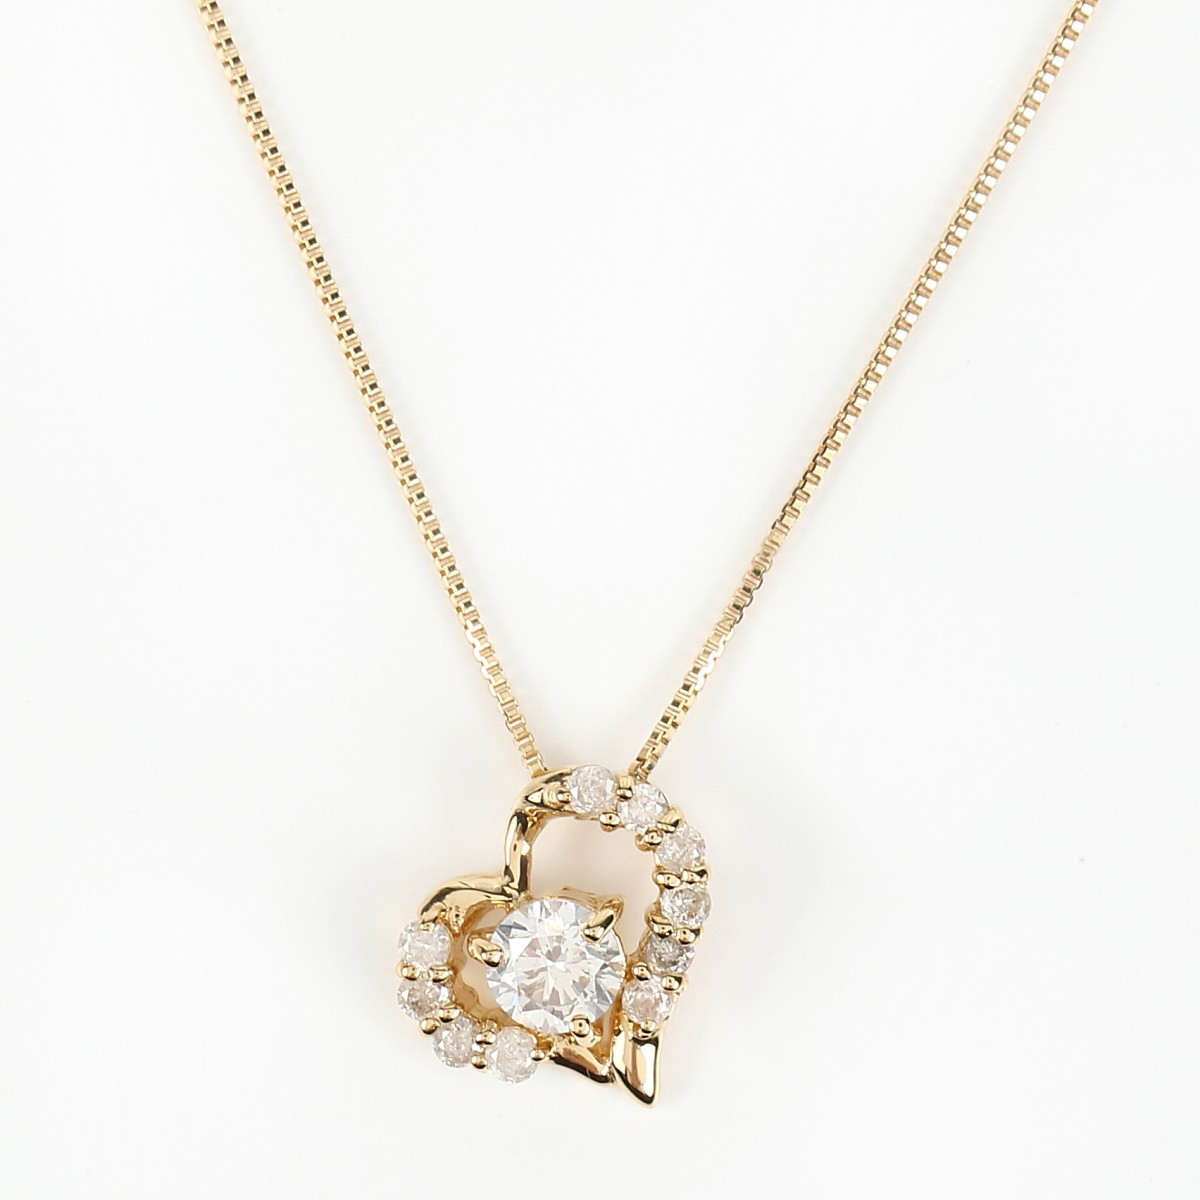 K18 ダイヤモンドネックレス ダイヤ 0.3ct (K18 0.5mm 40cm ベネチアンチェーン)